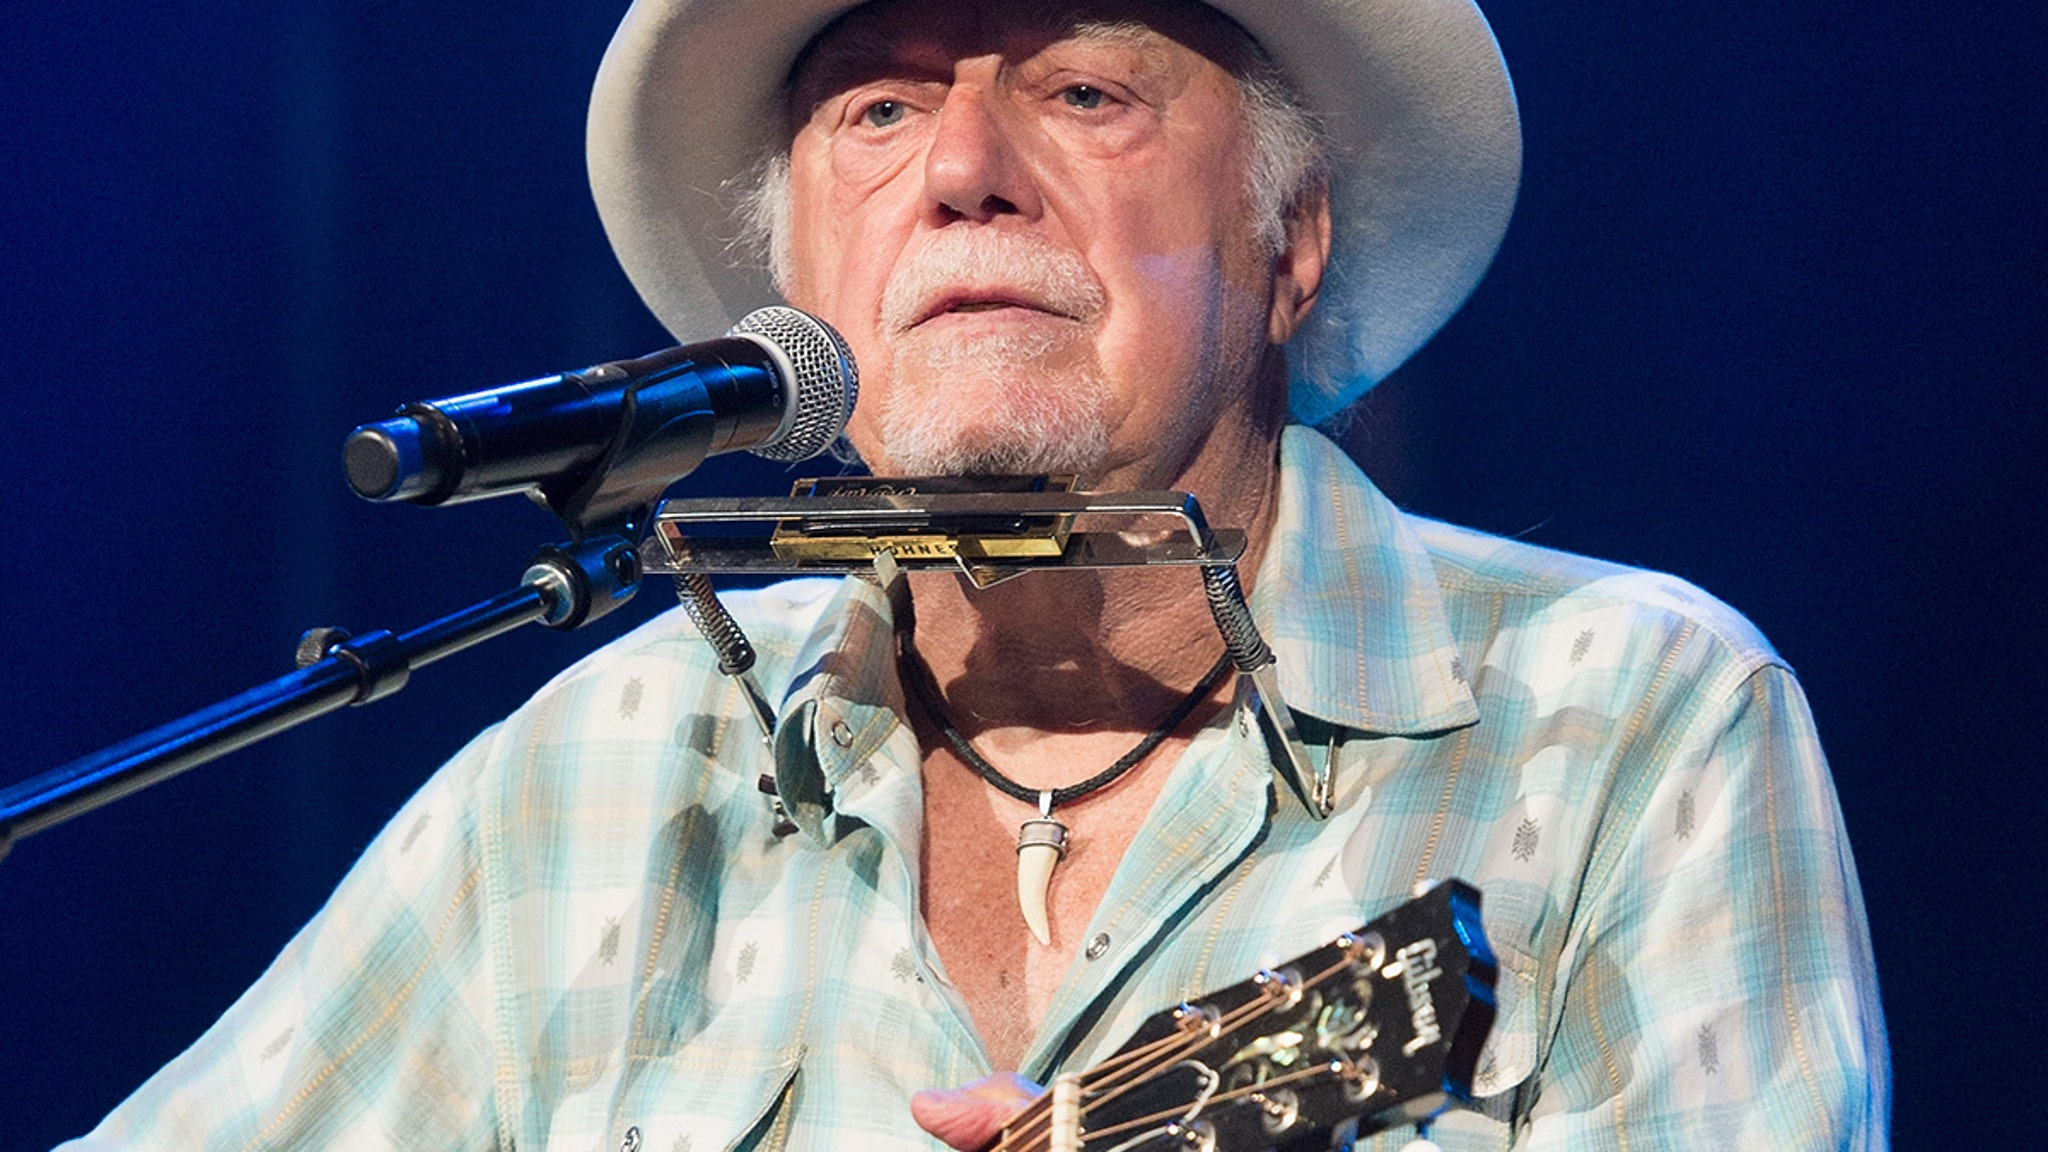 'Mr. Bojangles' songwriter Jerry Jeff Walker Dead at 78